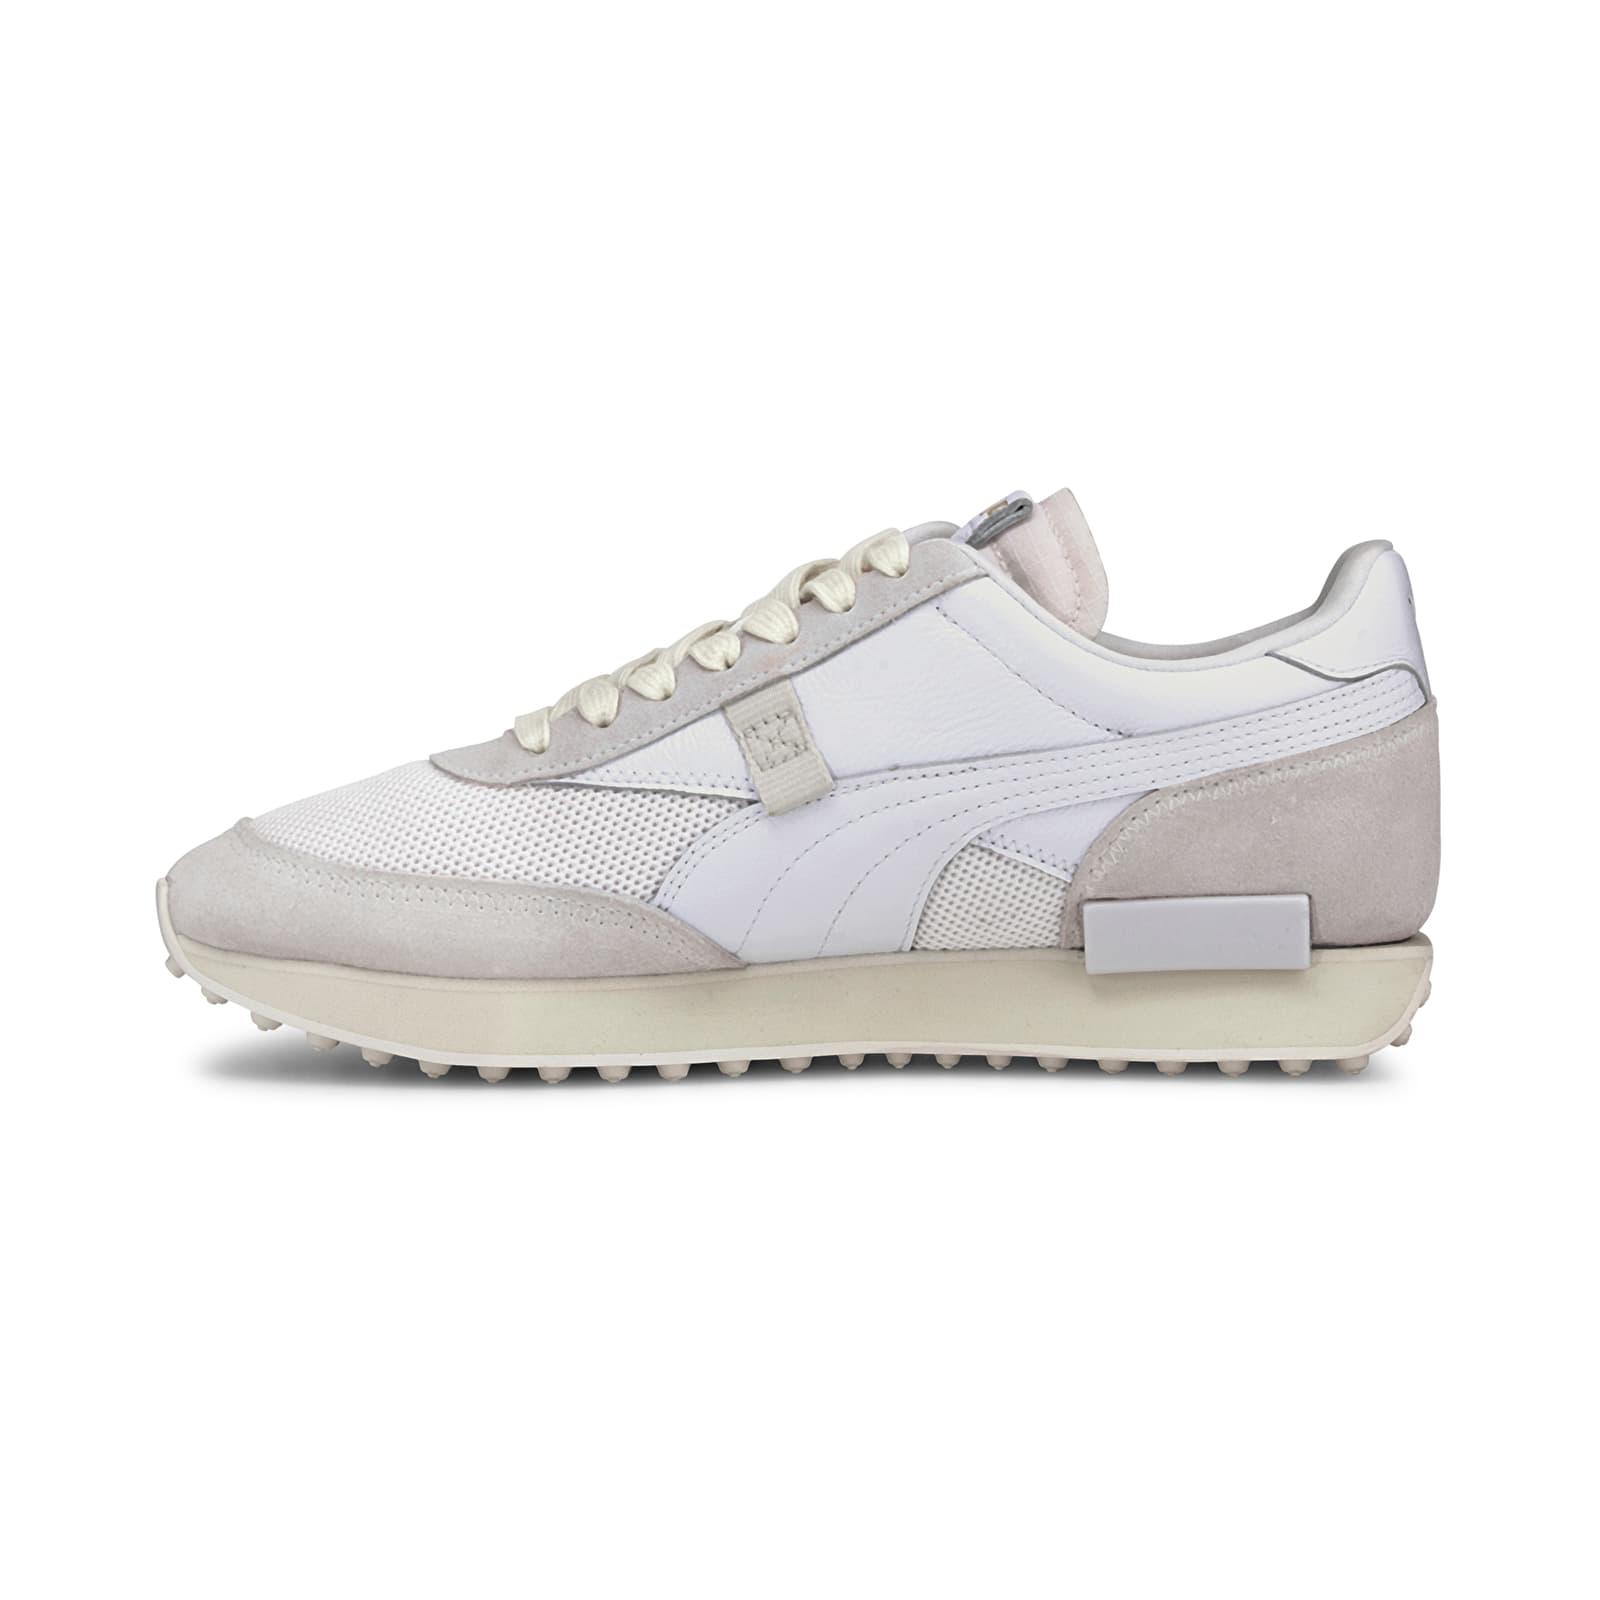 Men's shoes Puma Future Rider Luxe Puma White-Whisper White